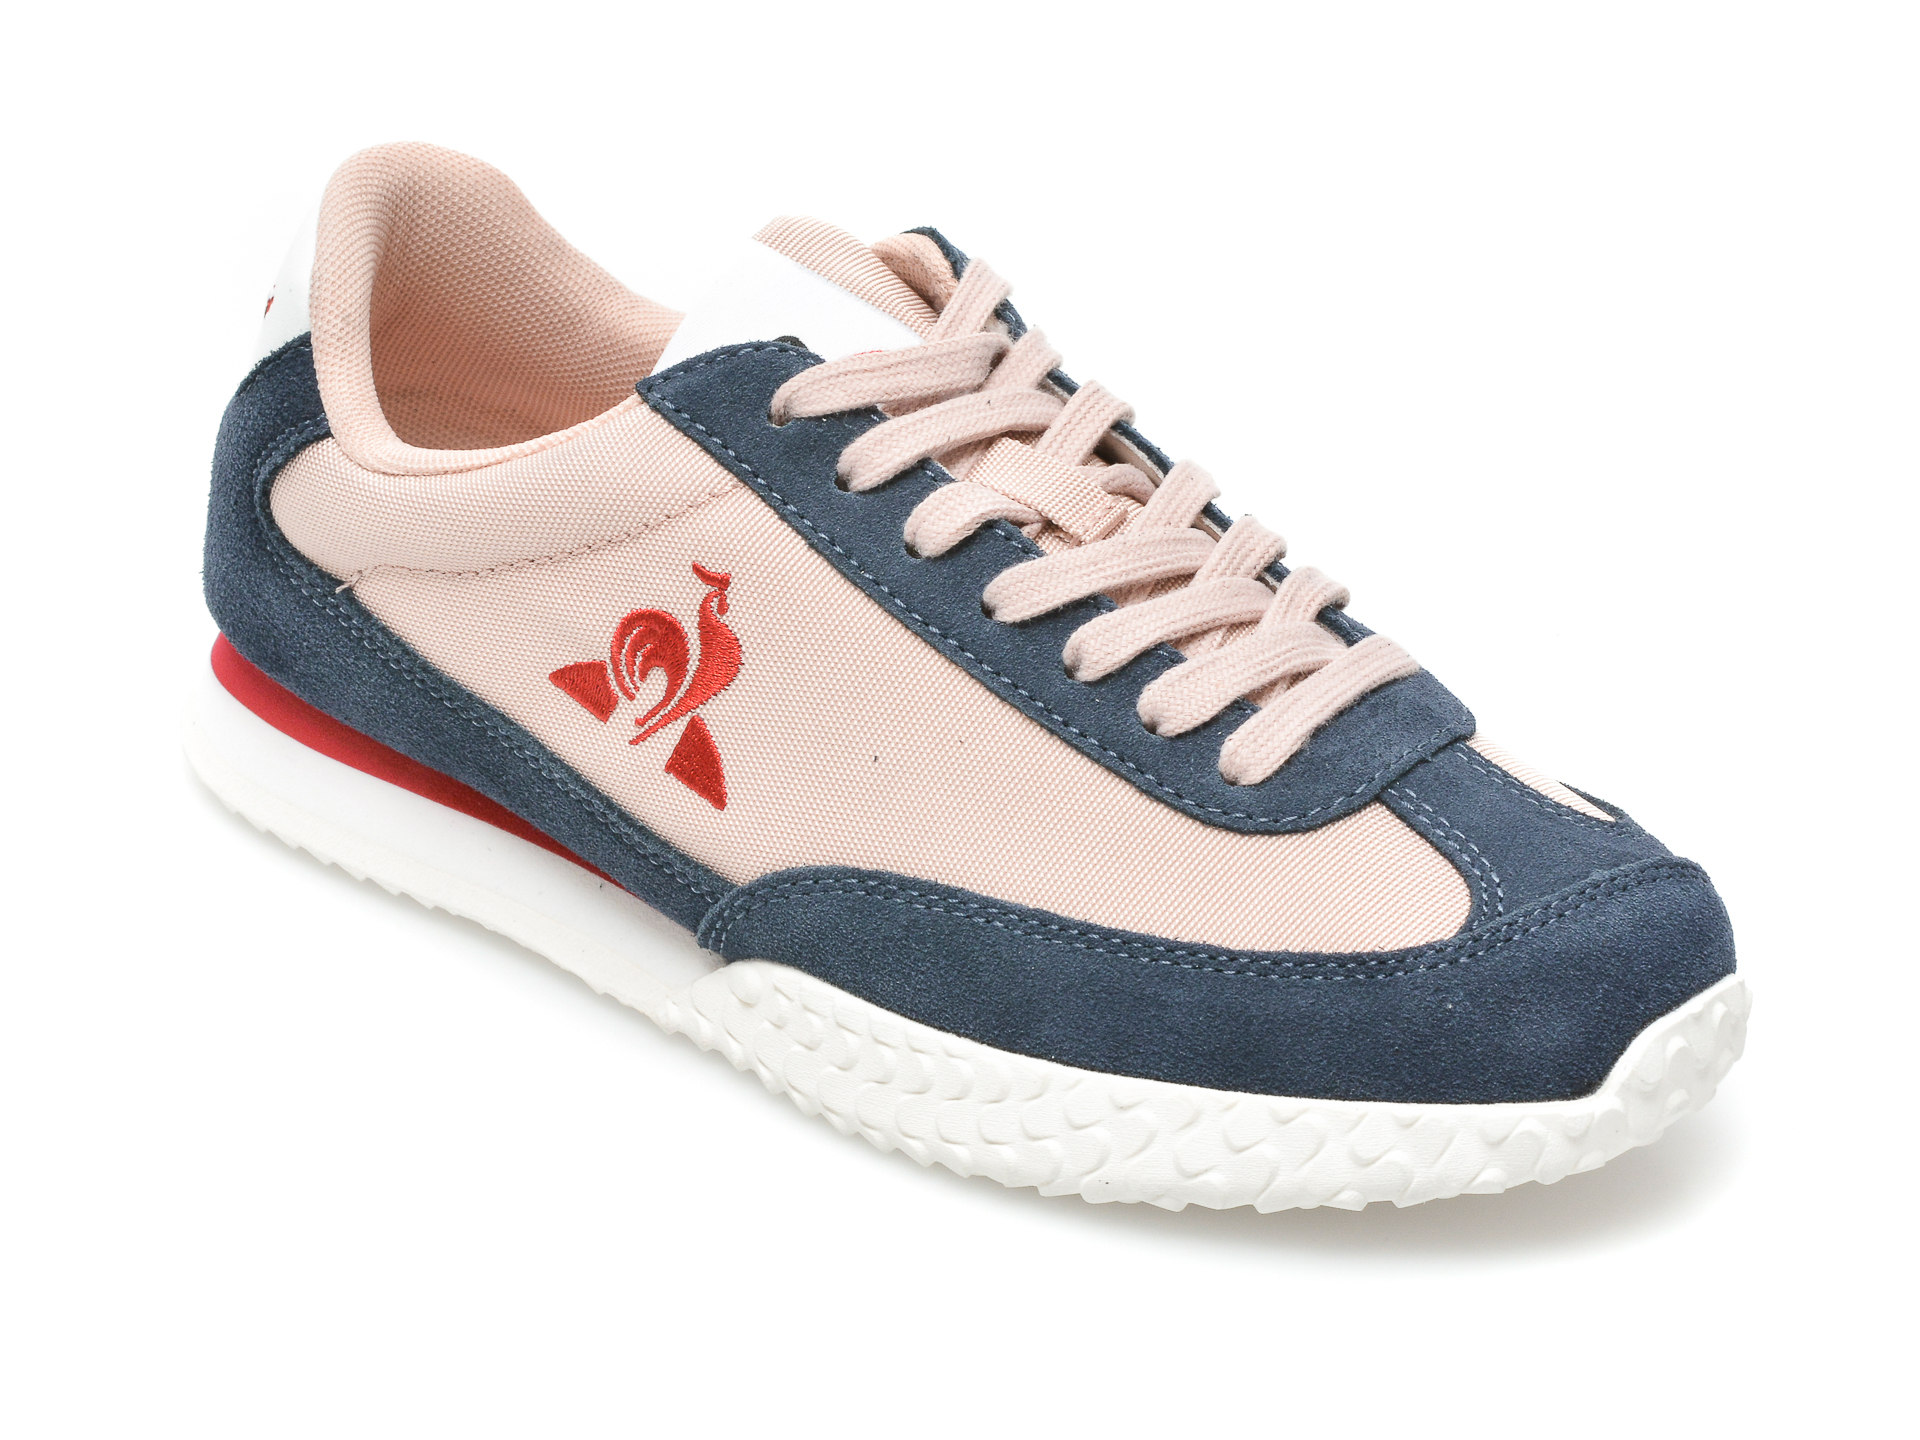 Pantofi sport LE COQ SPORTIF roz, Veloce W, din material textil si piele intoarsa imagine otter.ro